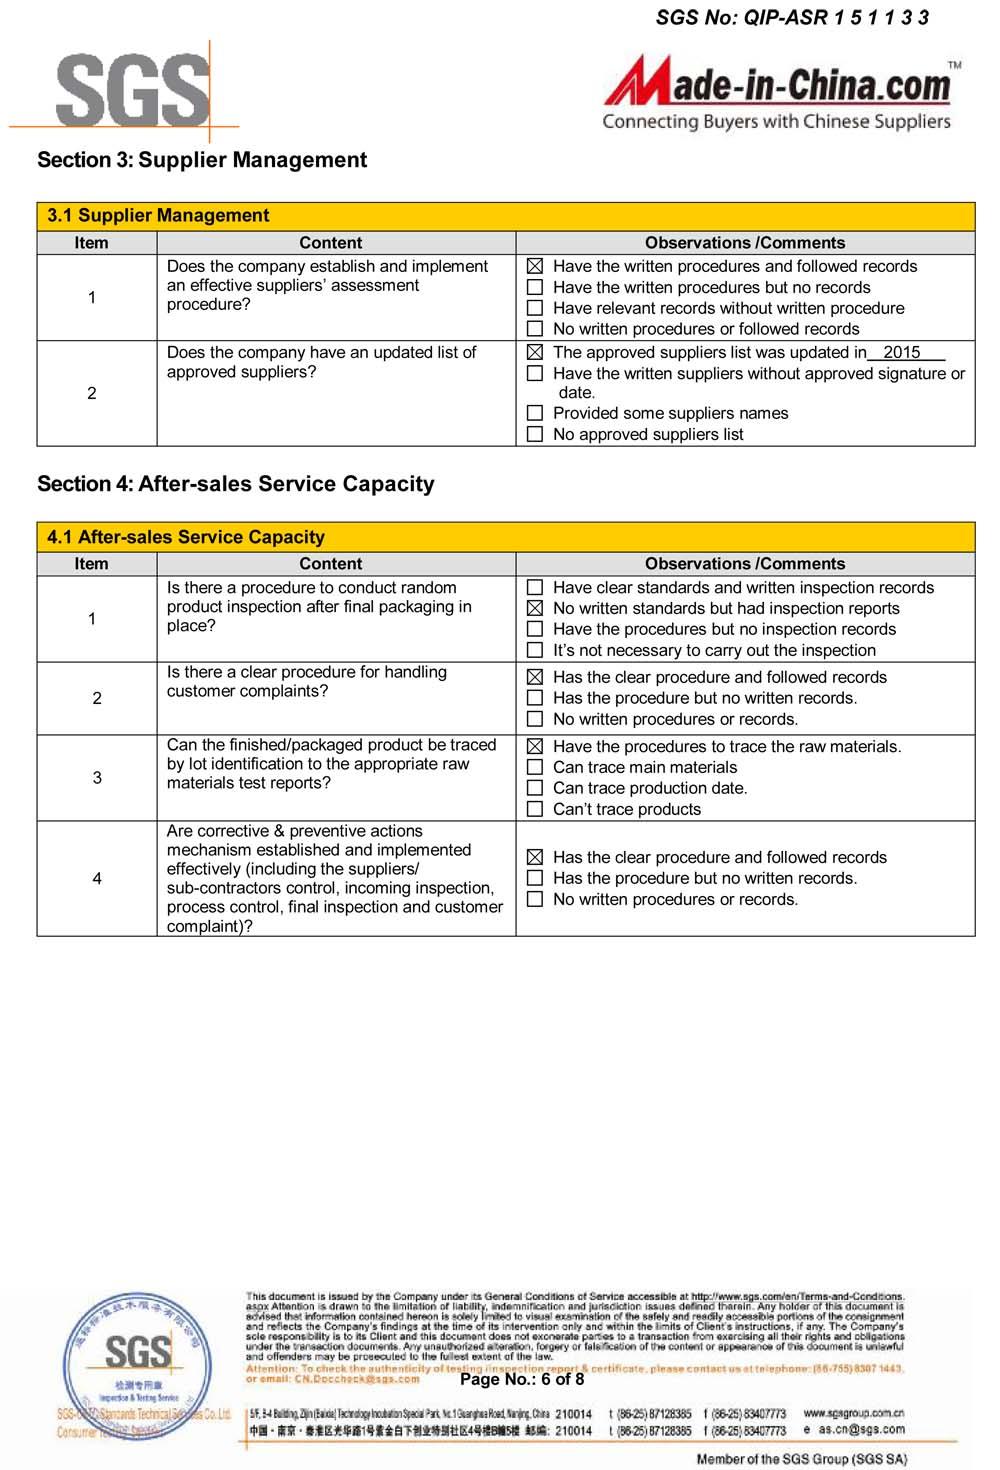 SGS Inspection Report Supplier Management